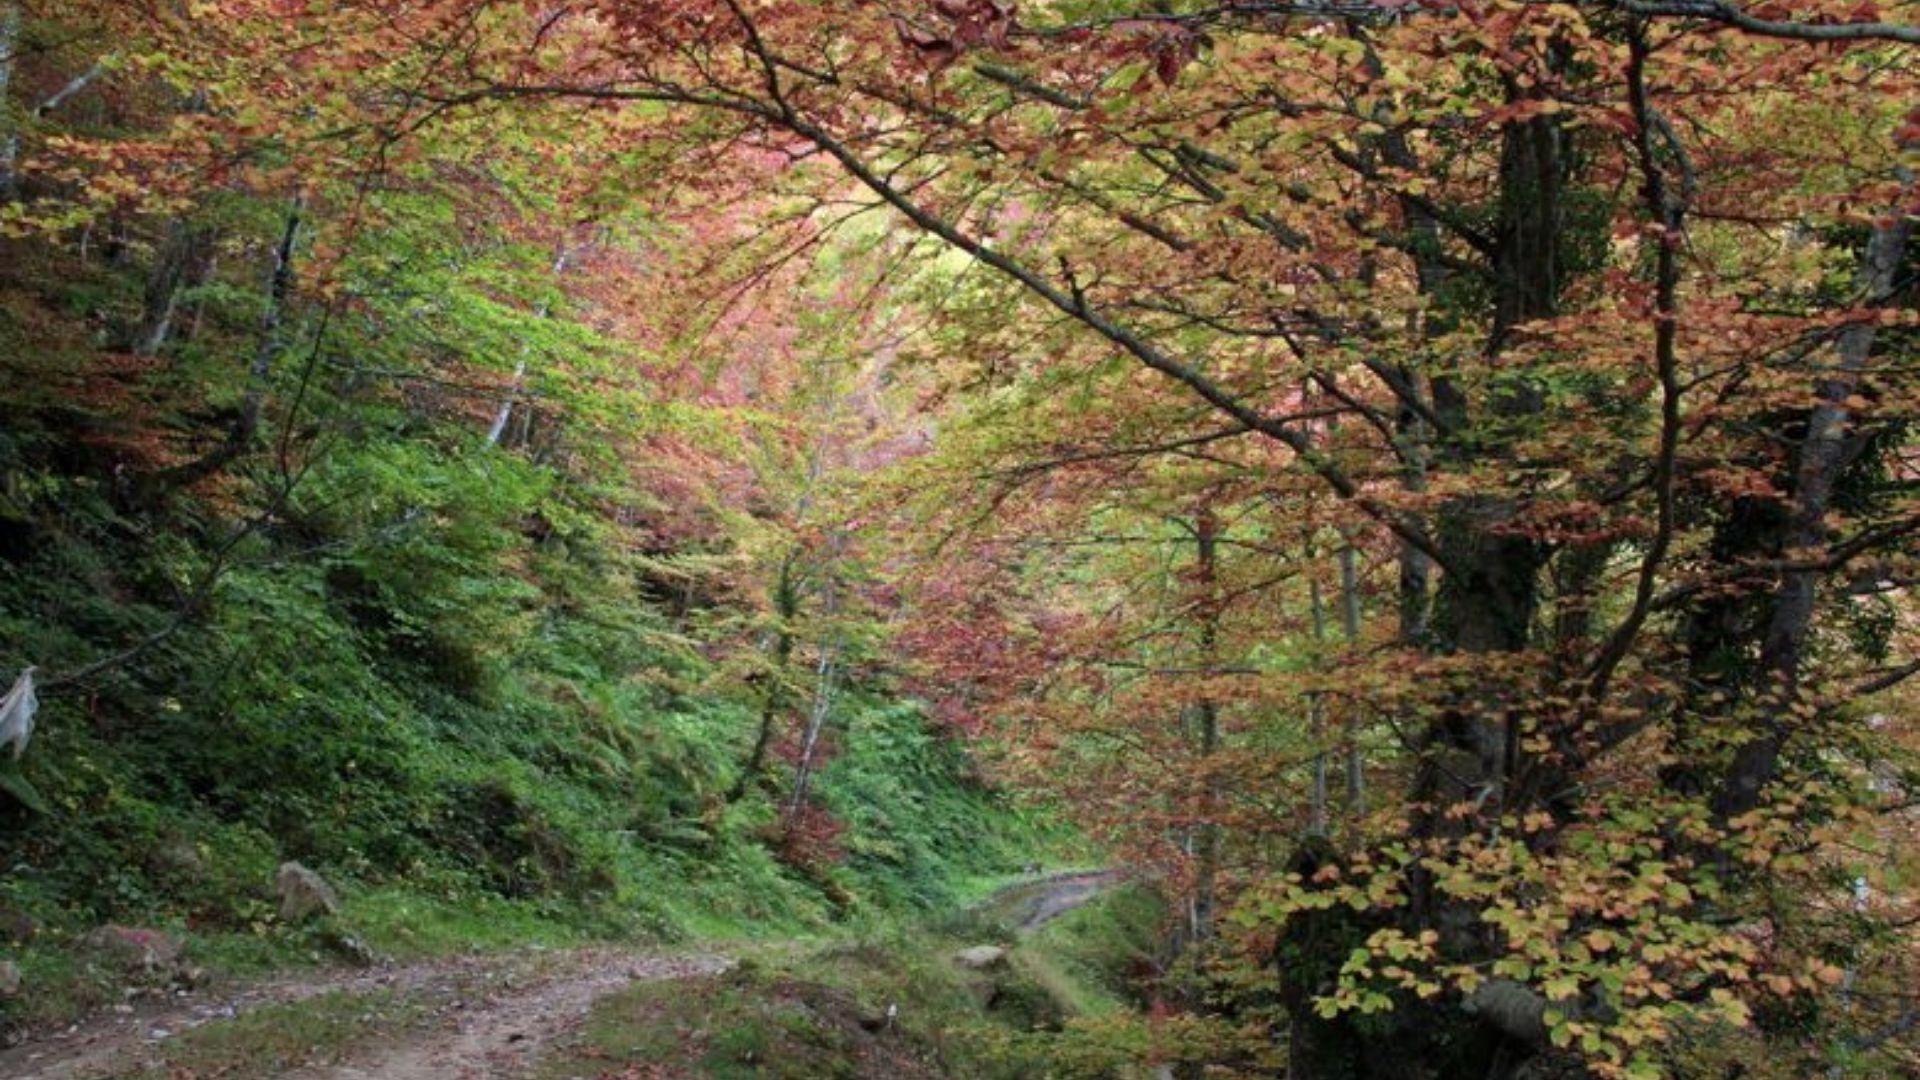 Bosque de Montegrande